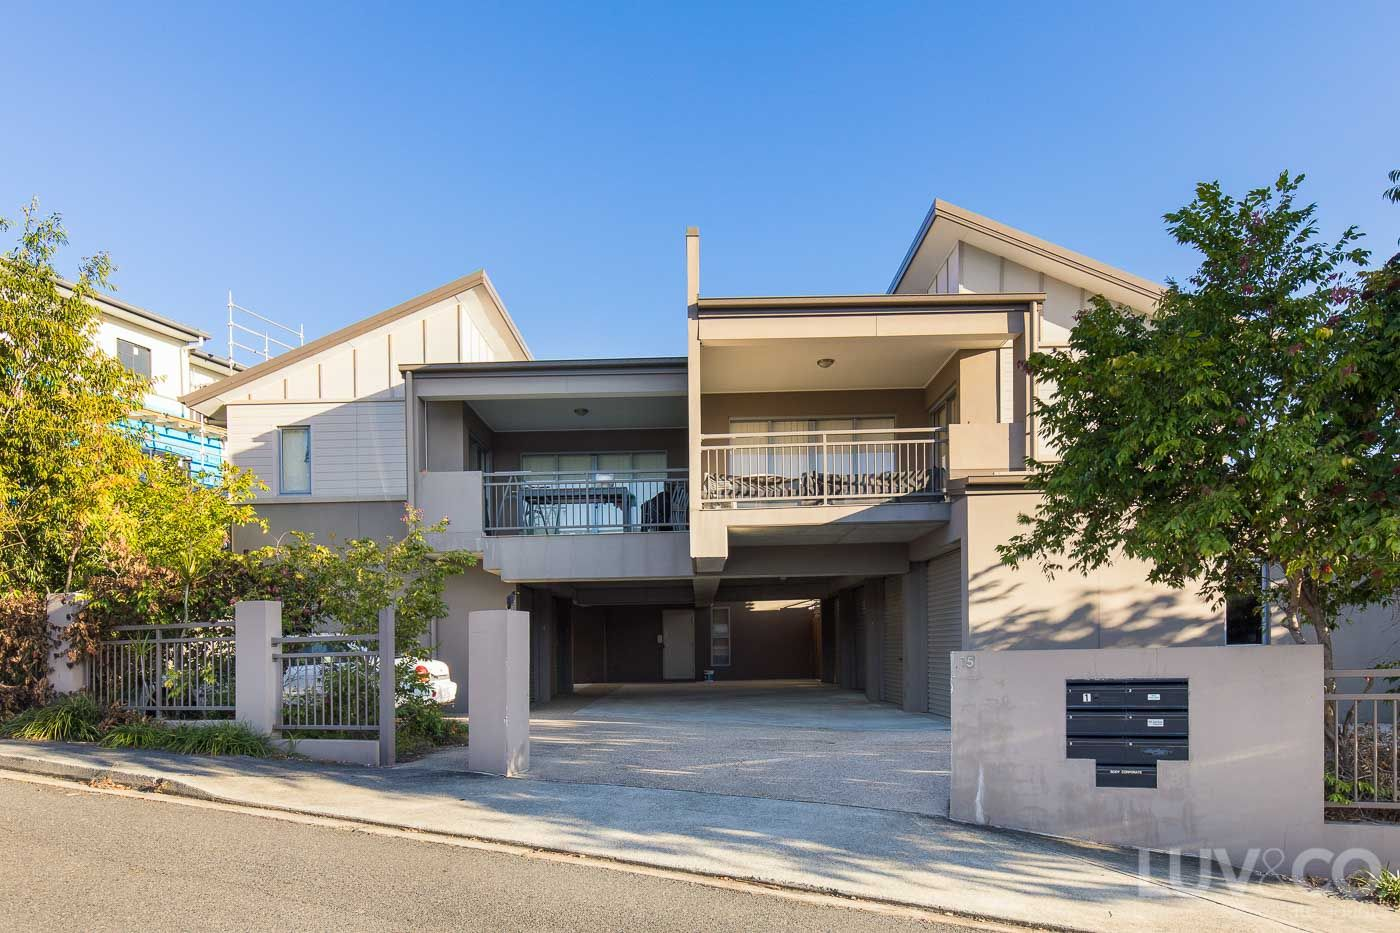 2/15 Crana Street, Gaythorne QLD 4051, Image 2